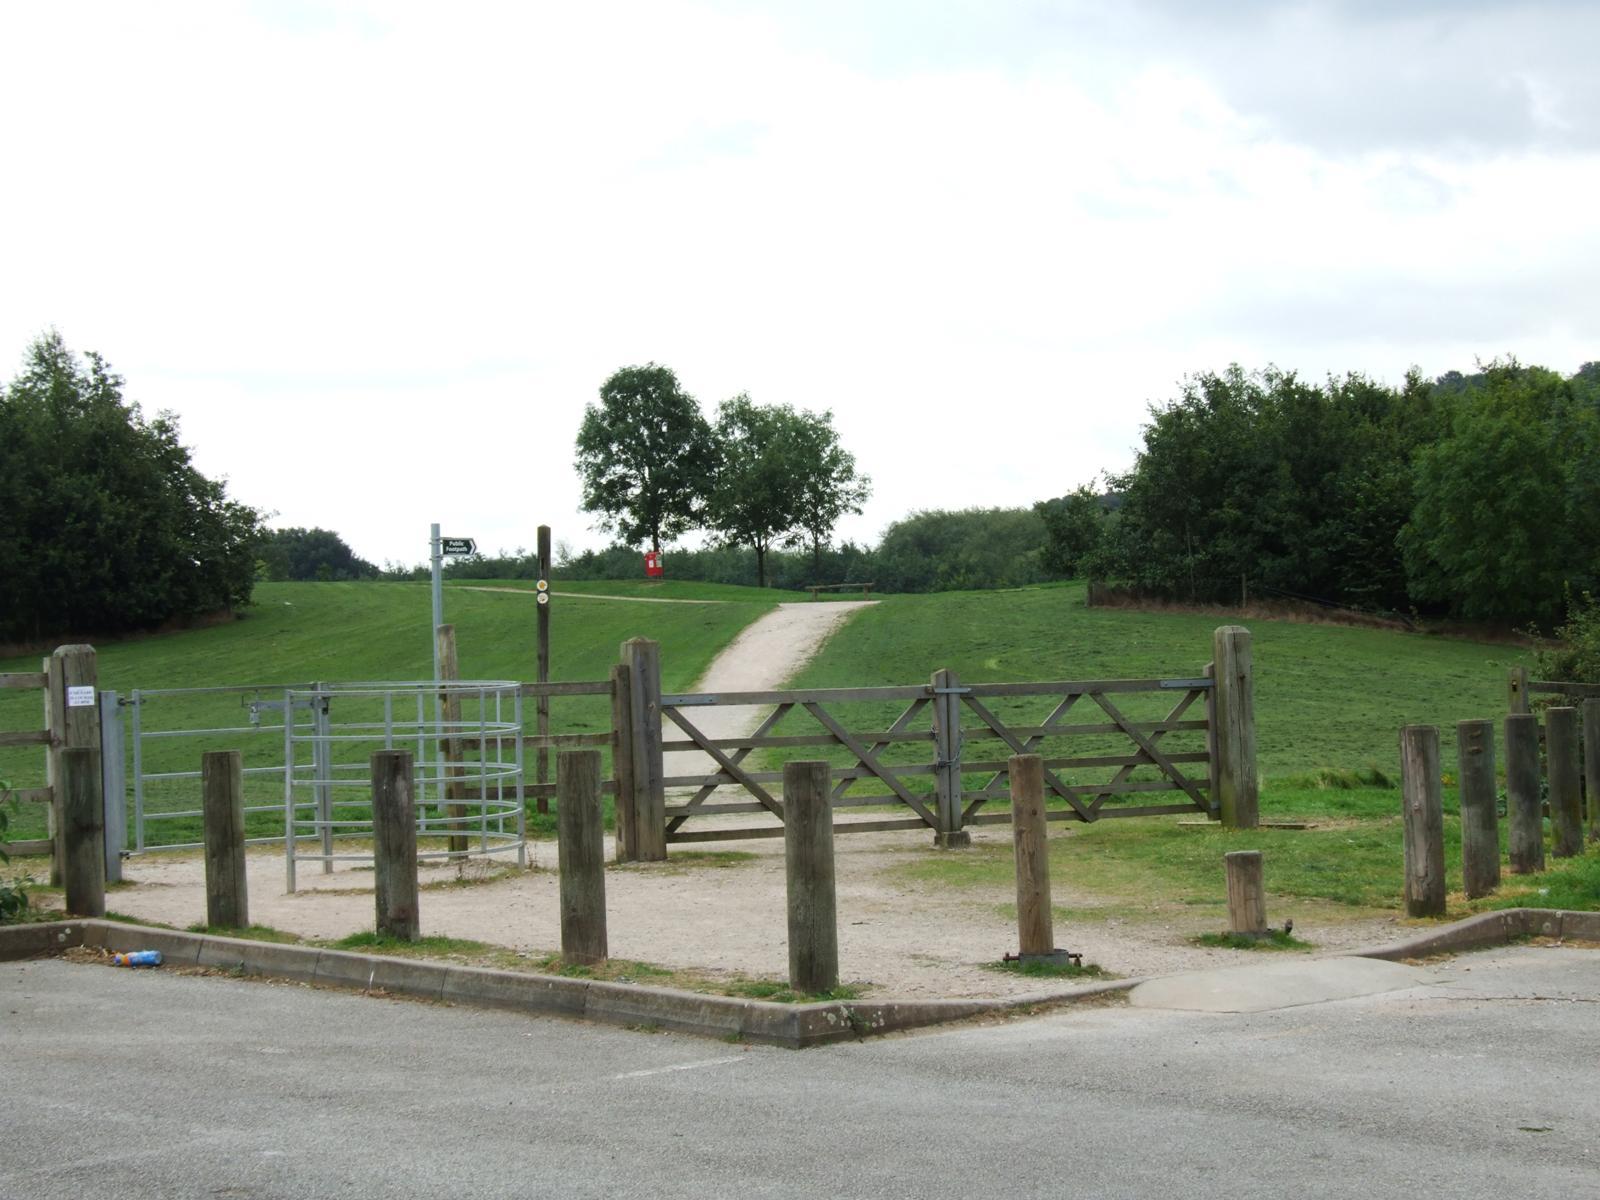 pit-lane-area